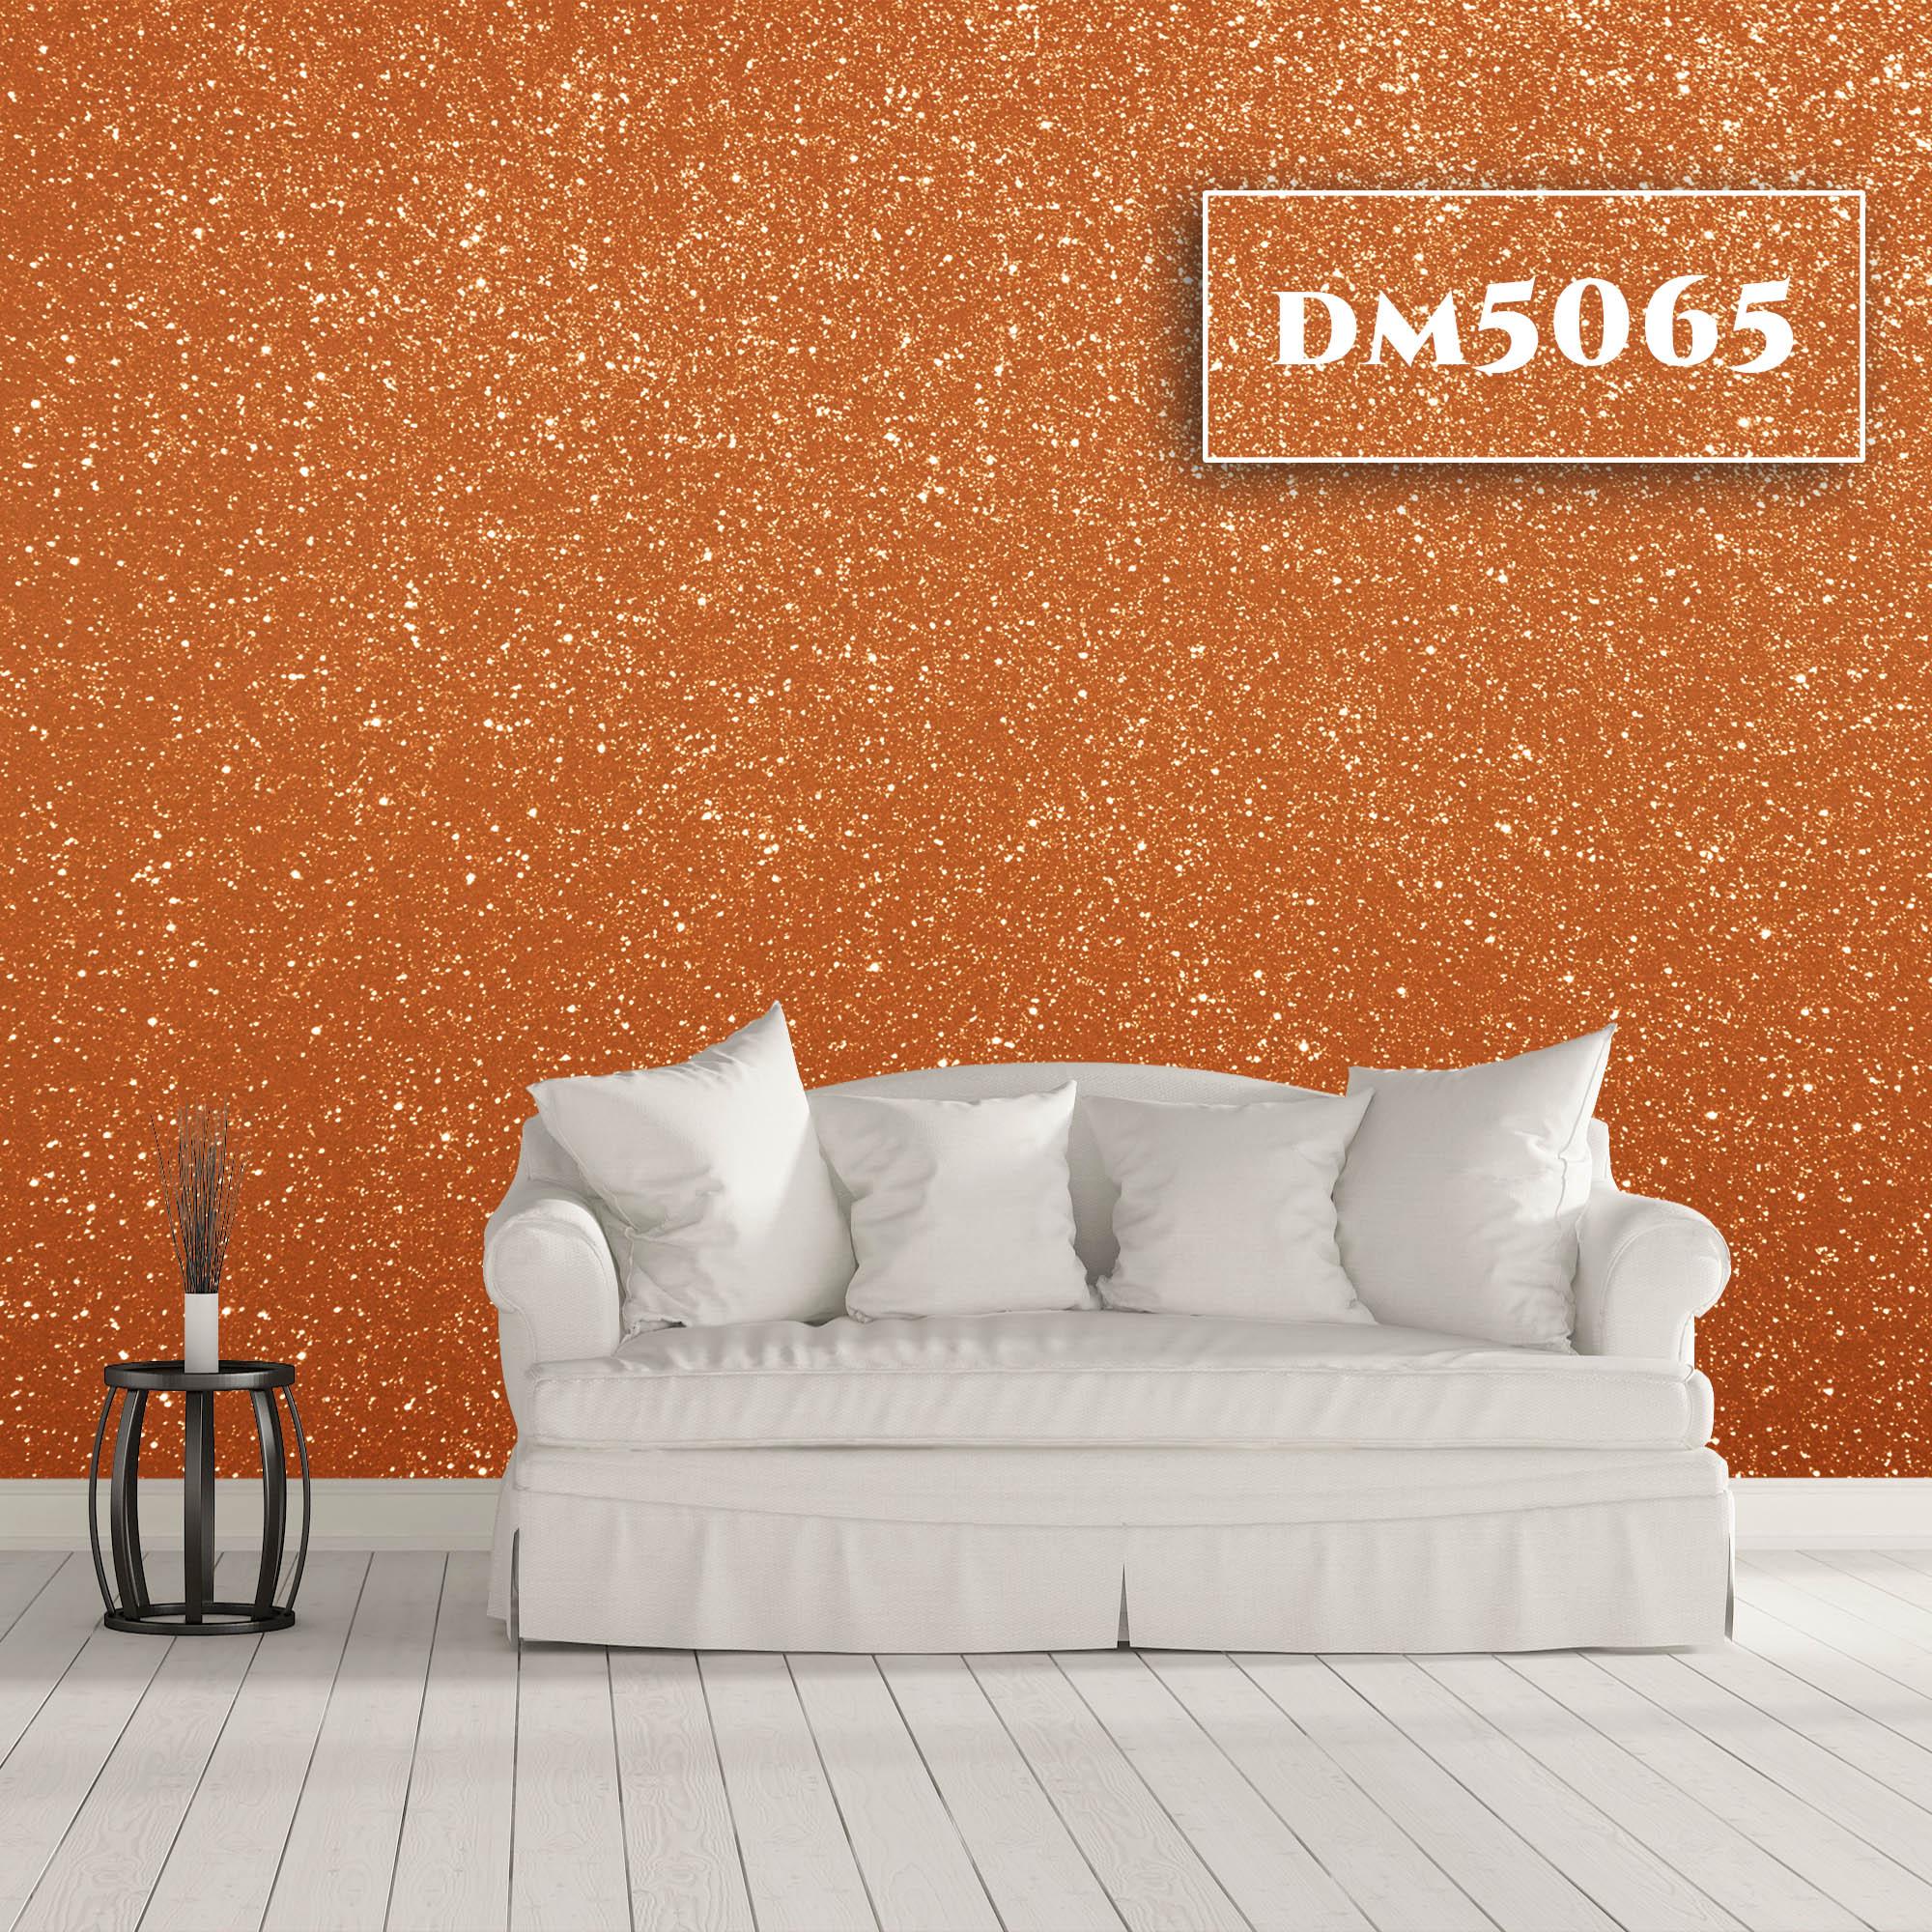 DM5065